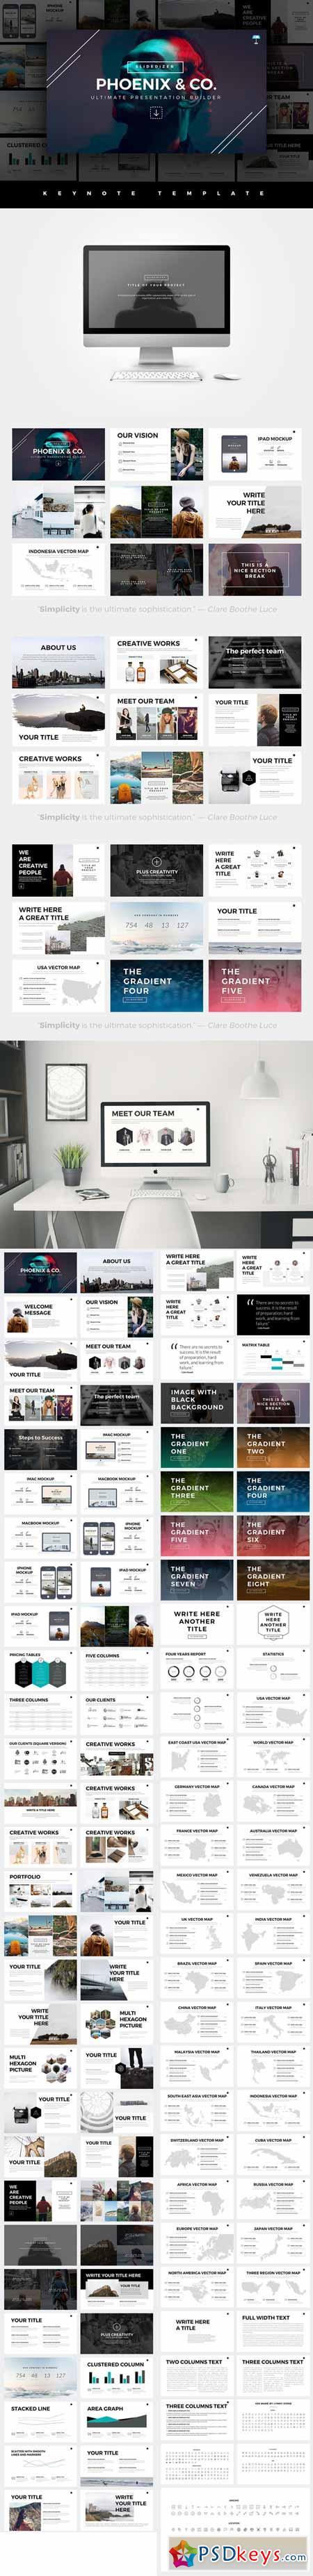 phoenix minimal keynote template 522250 free download photoshop vector stock image via torrent. Black Bedroom Furniture Sets. Home Design Ideas